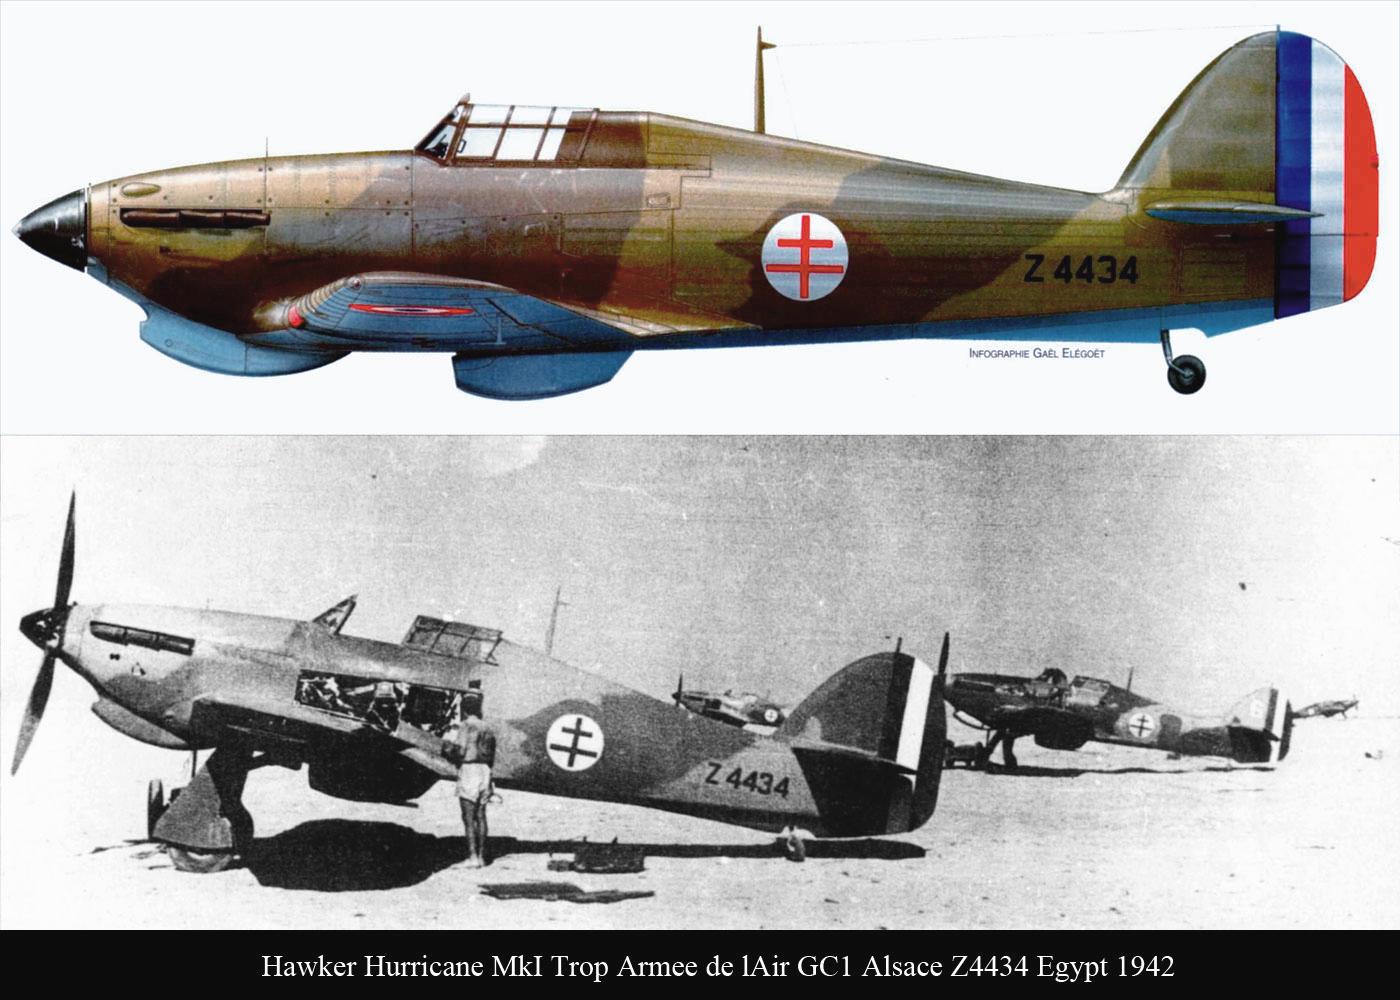 Hawker Hurricane I Trop Armee de lAir GC1 Z4434 Egypt 1942 01